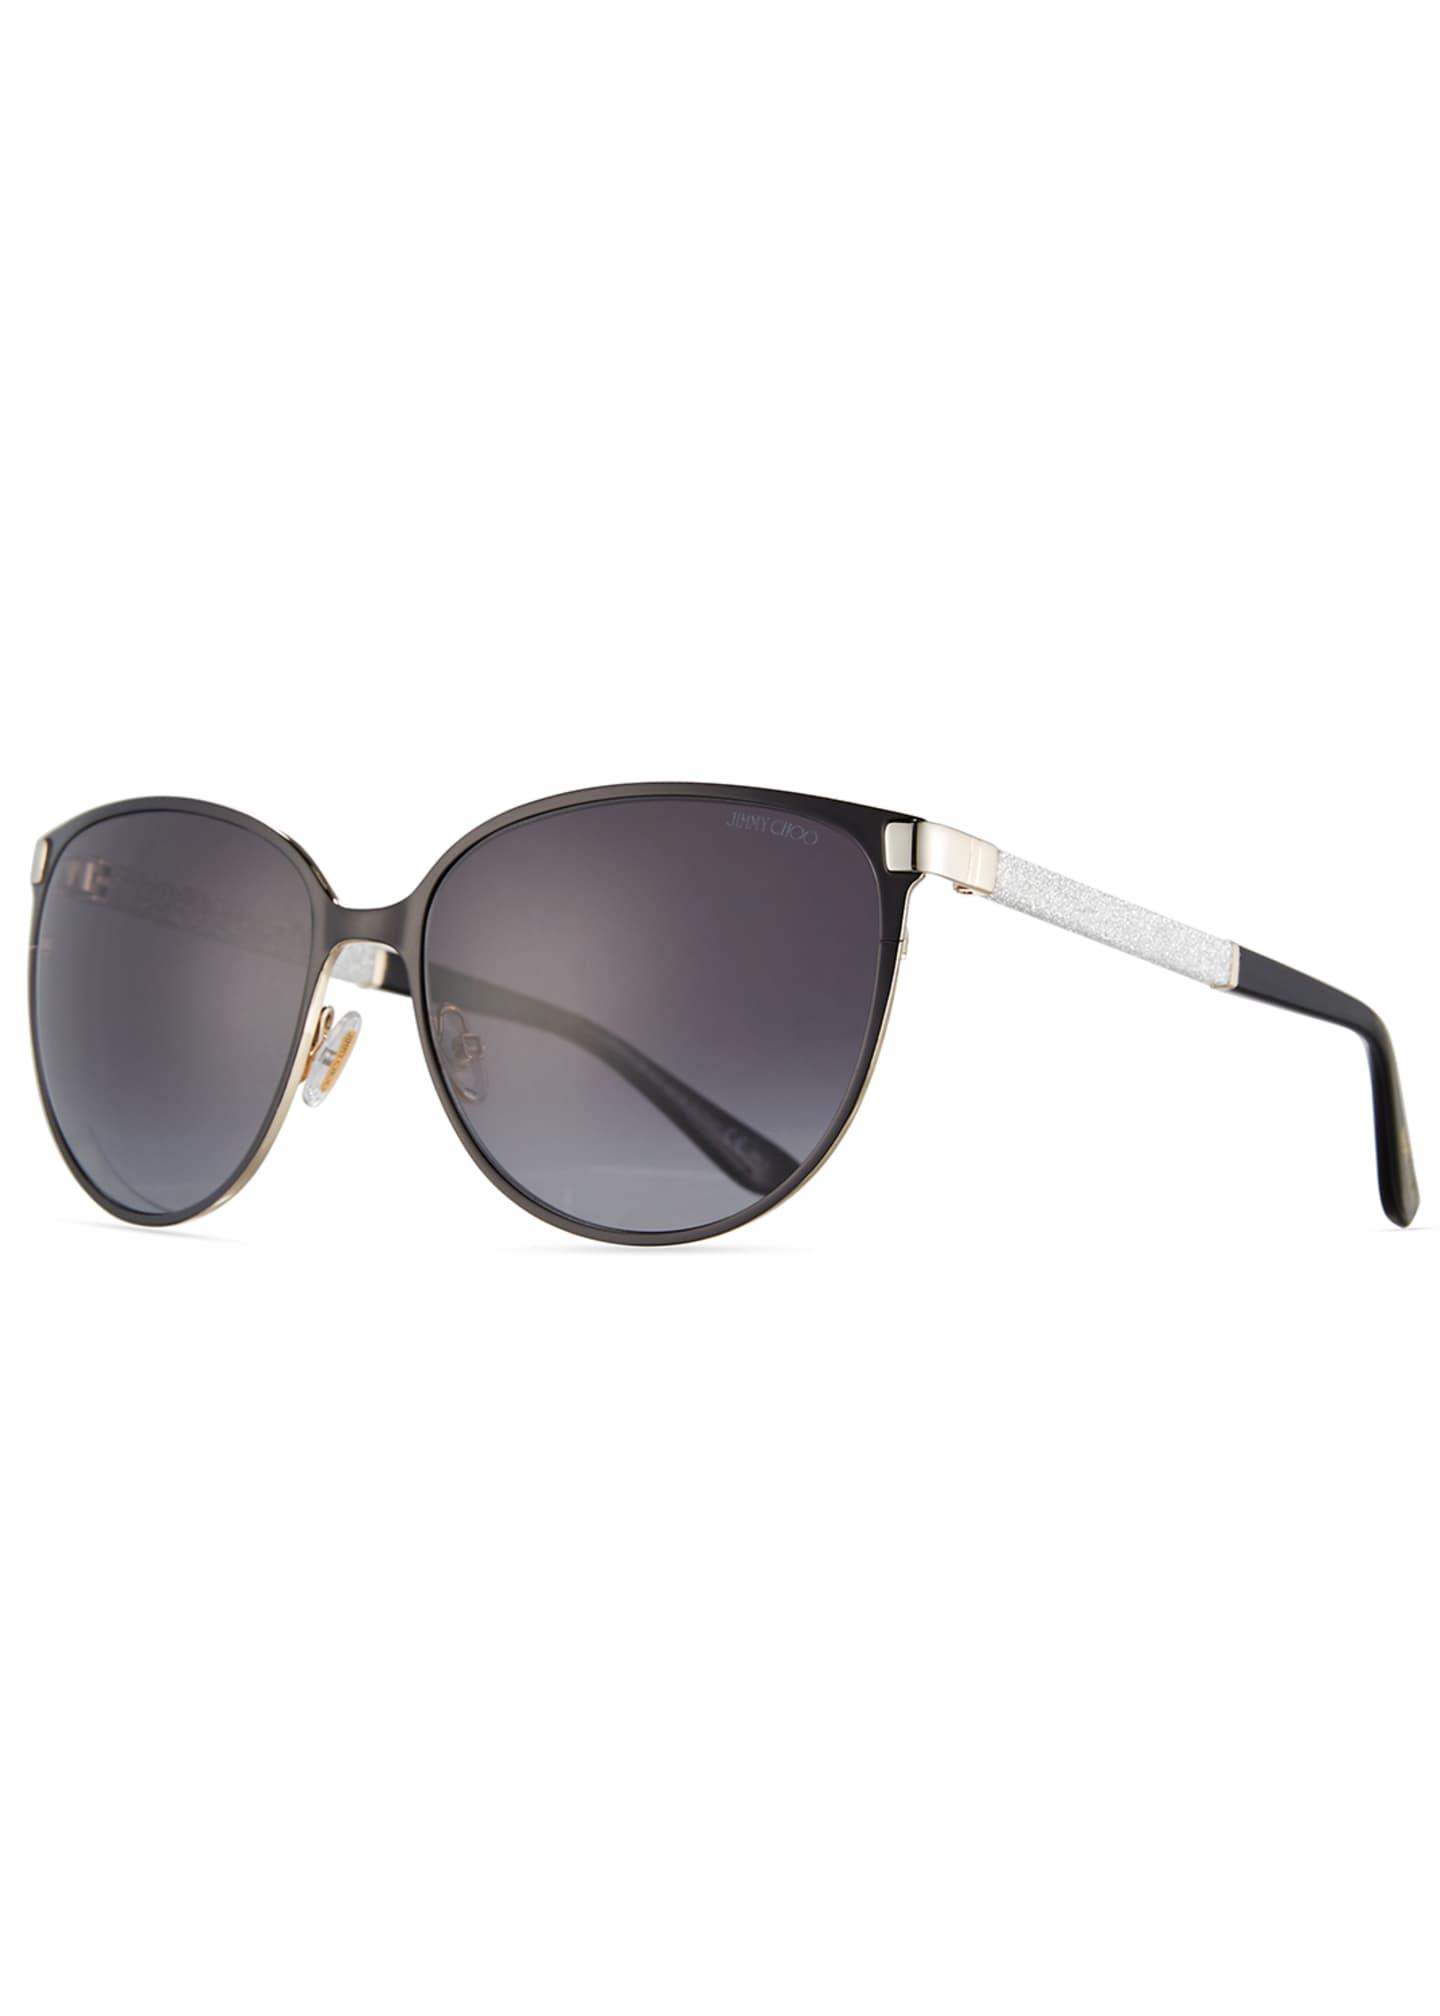 Jimmy Choo Posie Crystal-Temple Round Sunglasses, Black